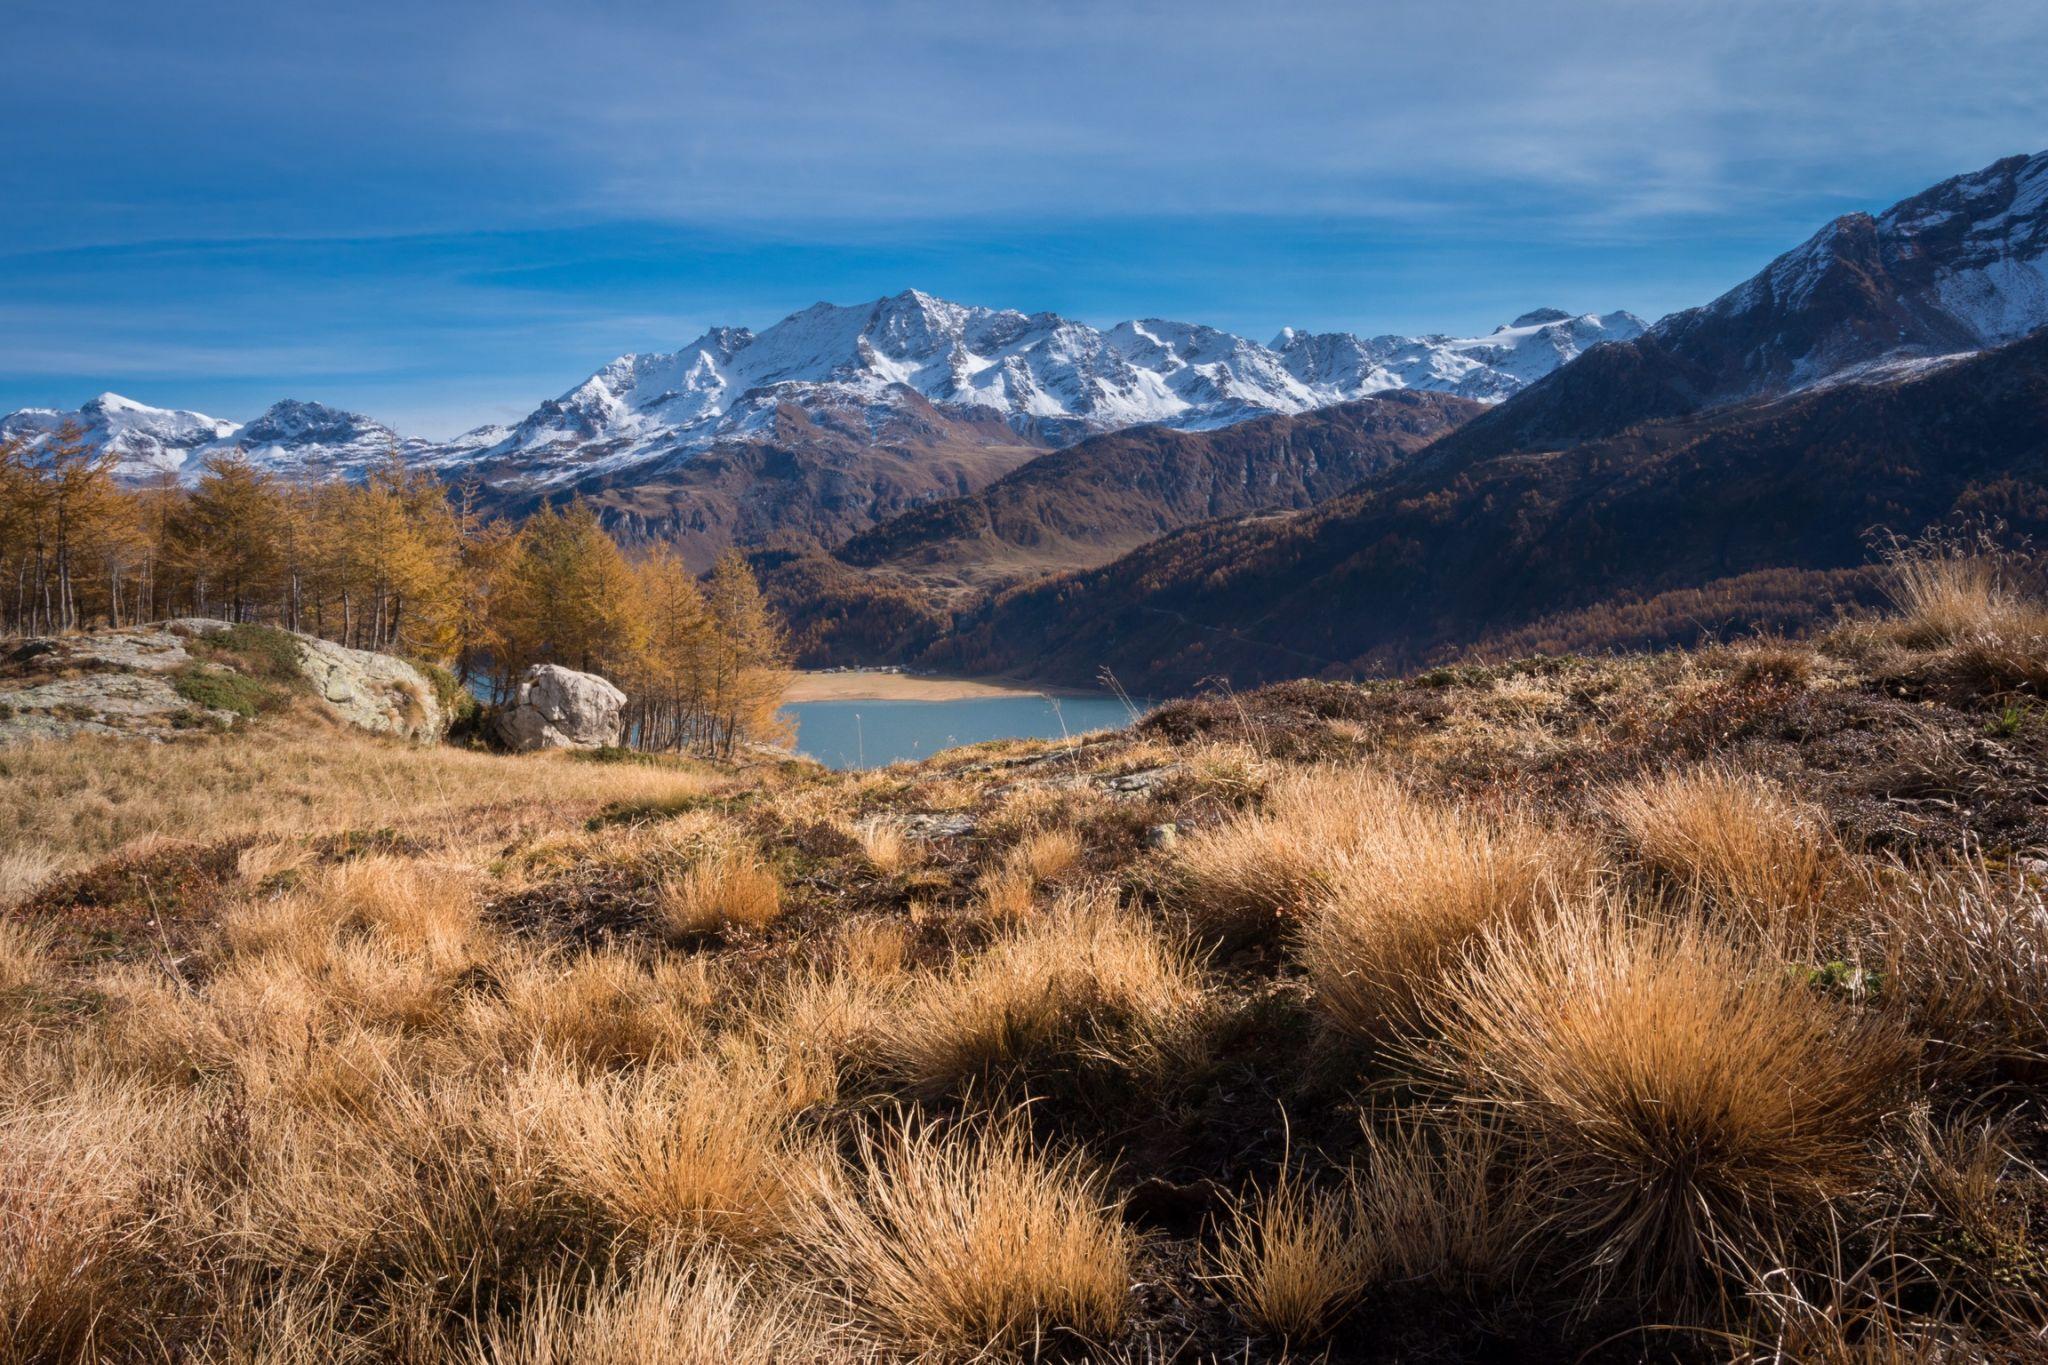 Via Engiadina near Blaunca, Switzerland